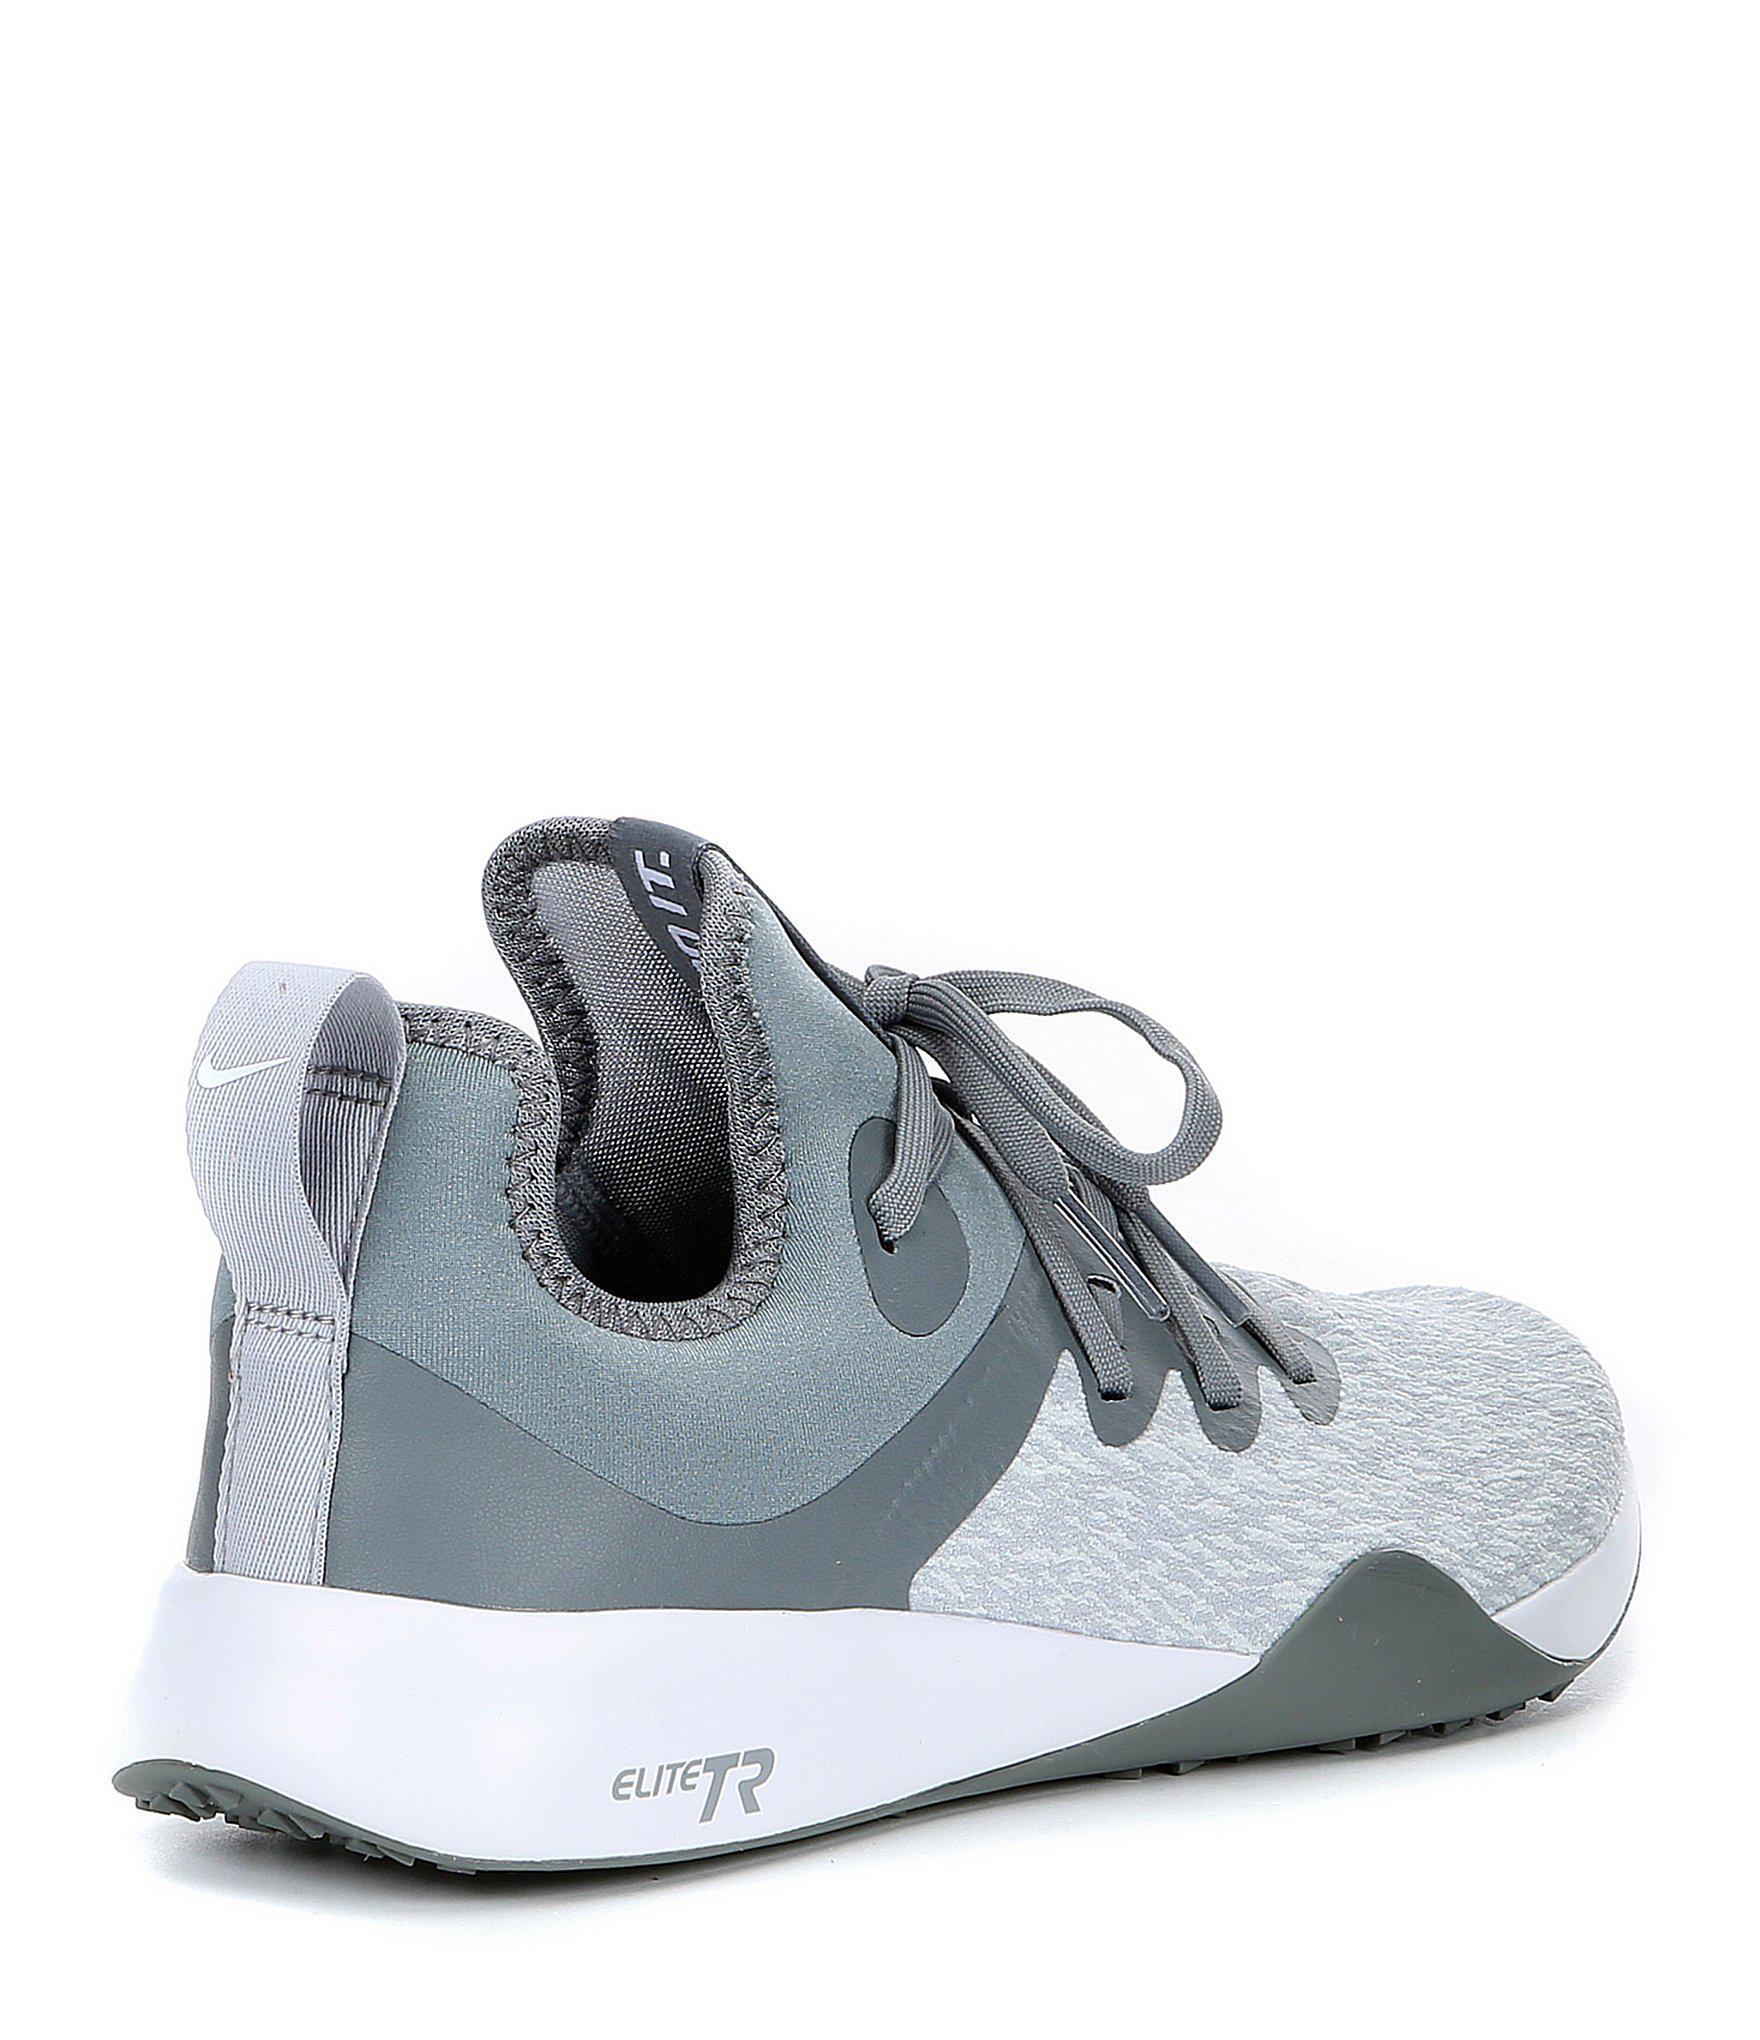 buy online 6953e 43905 Nike Women s Foundation Elite Tr Training Shoe in Gray - Lyst